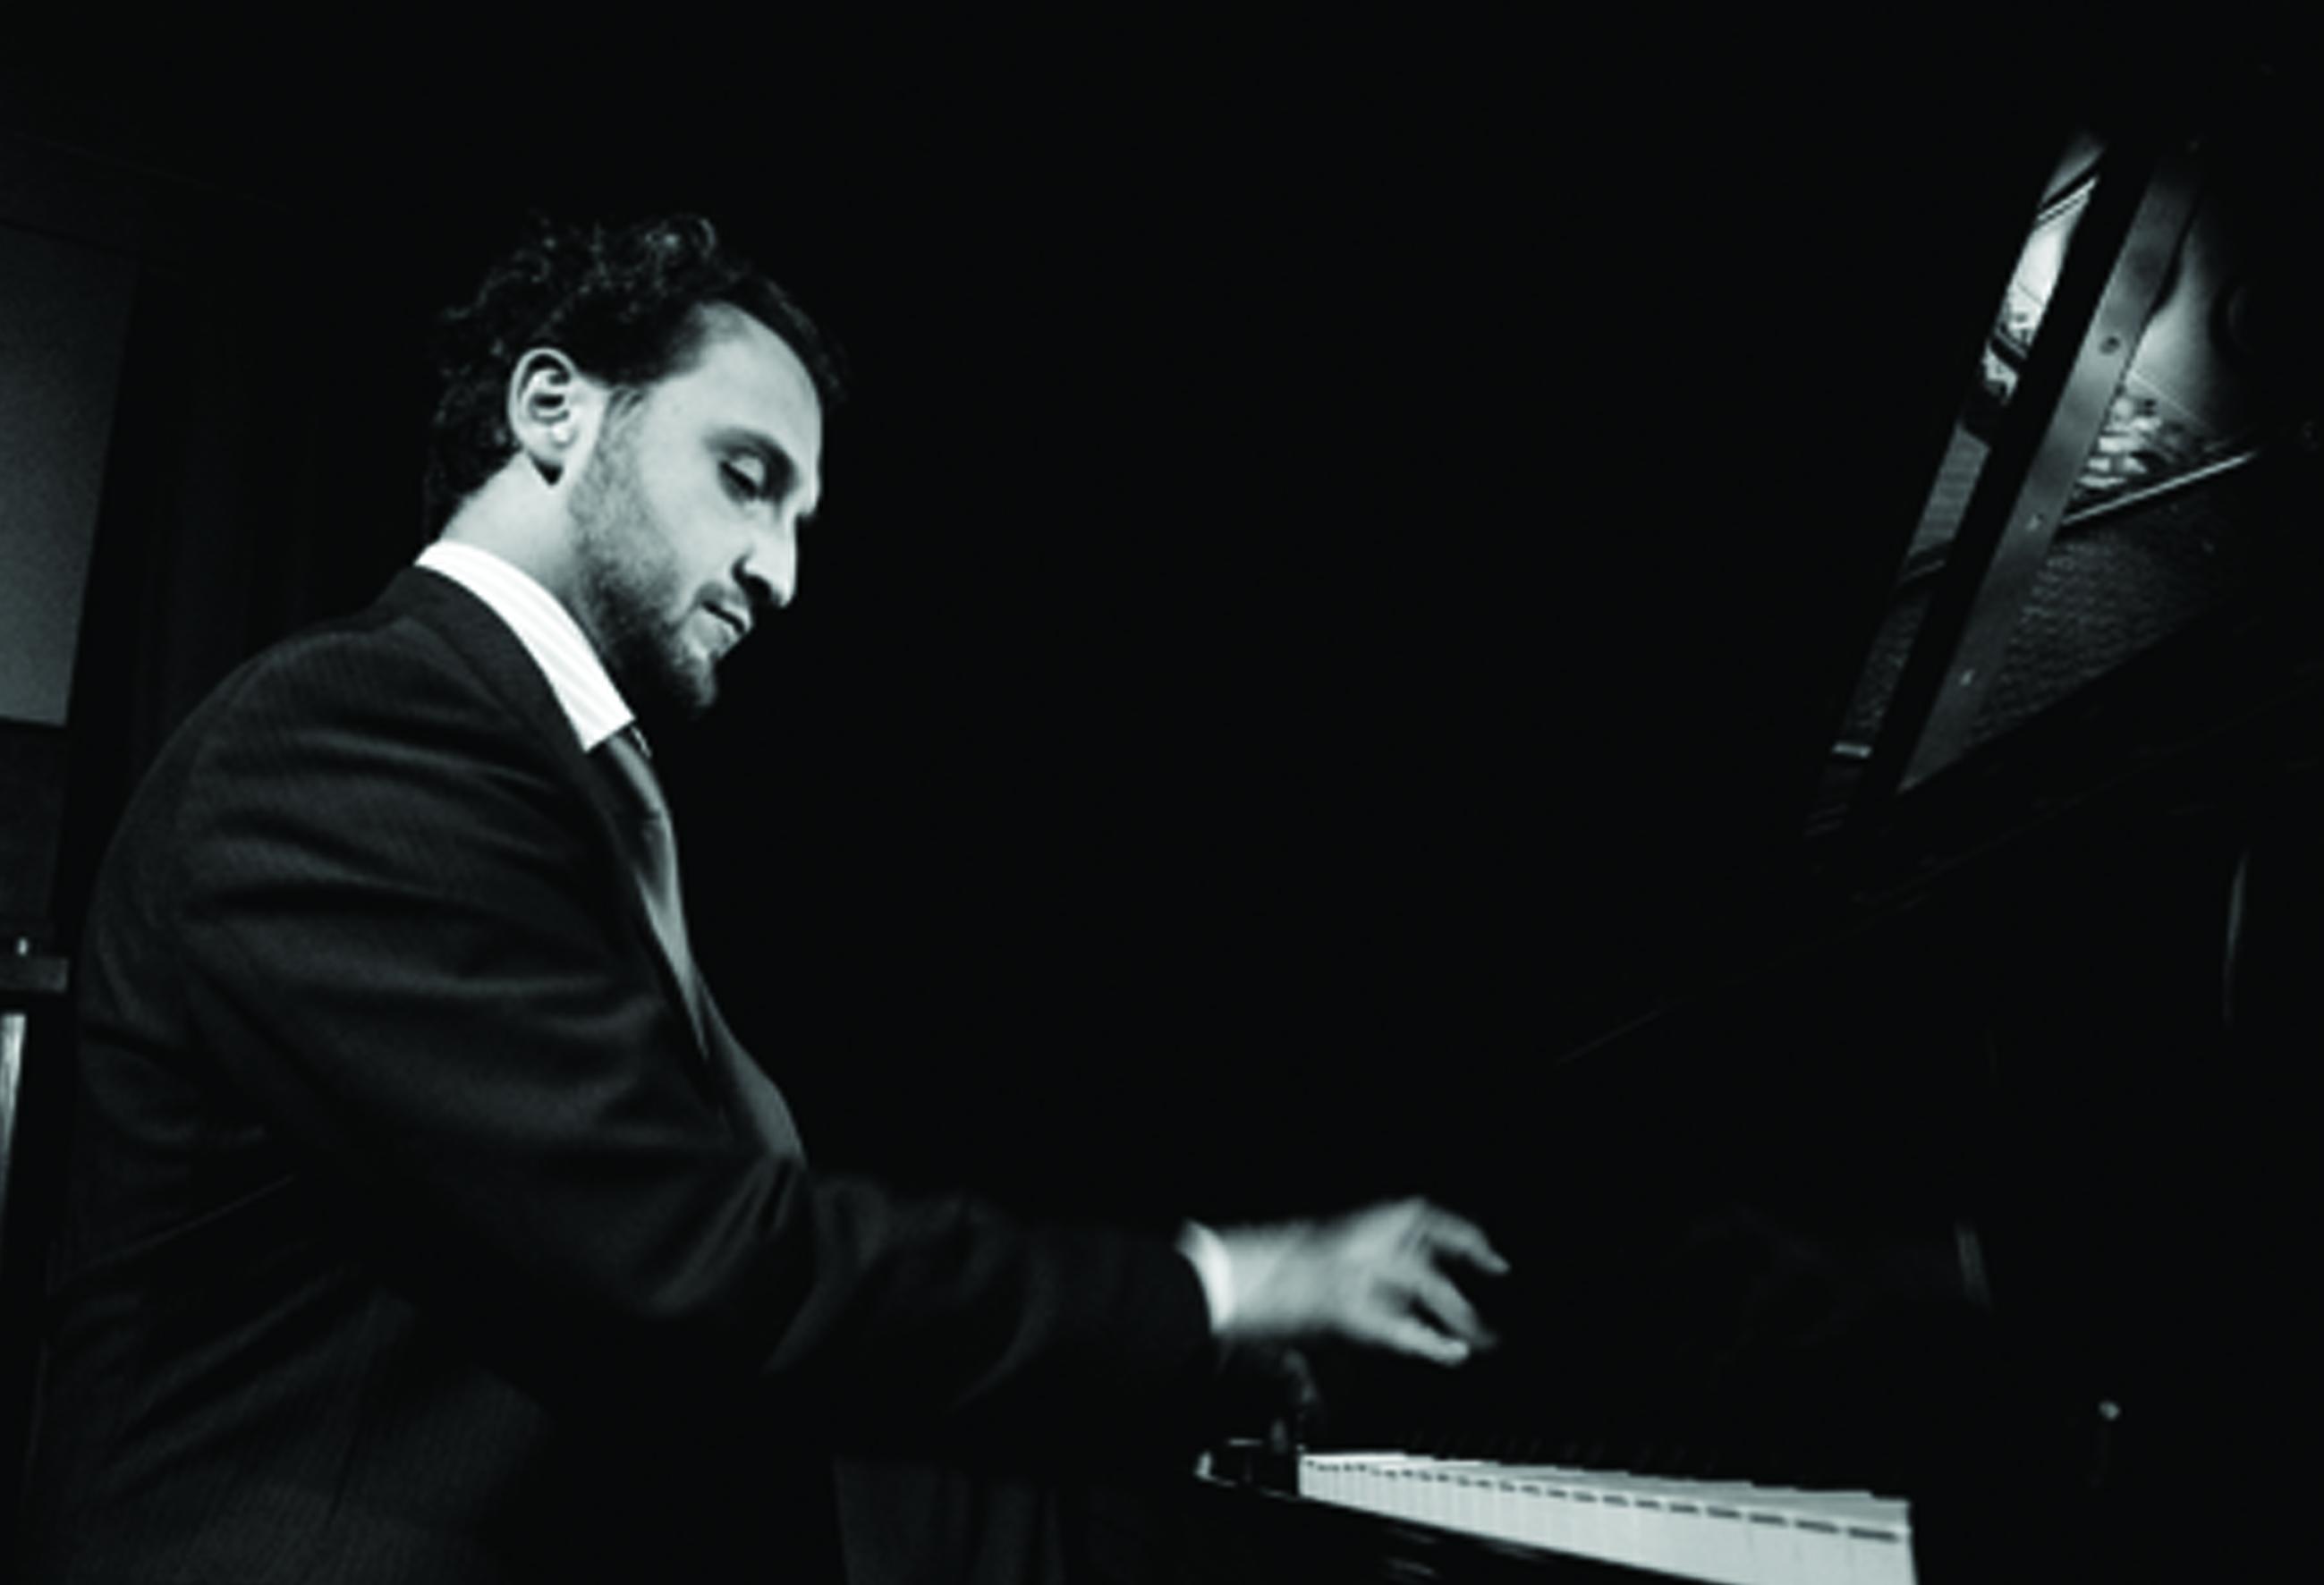 Stéphane Orlando